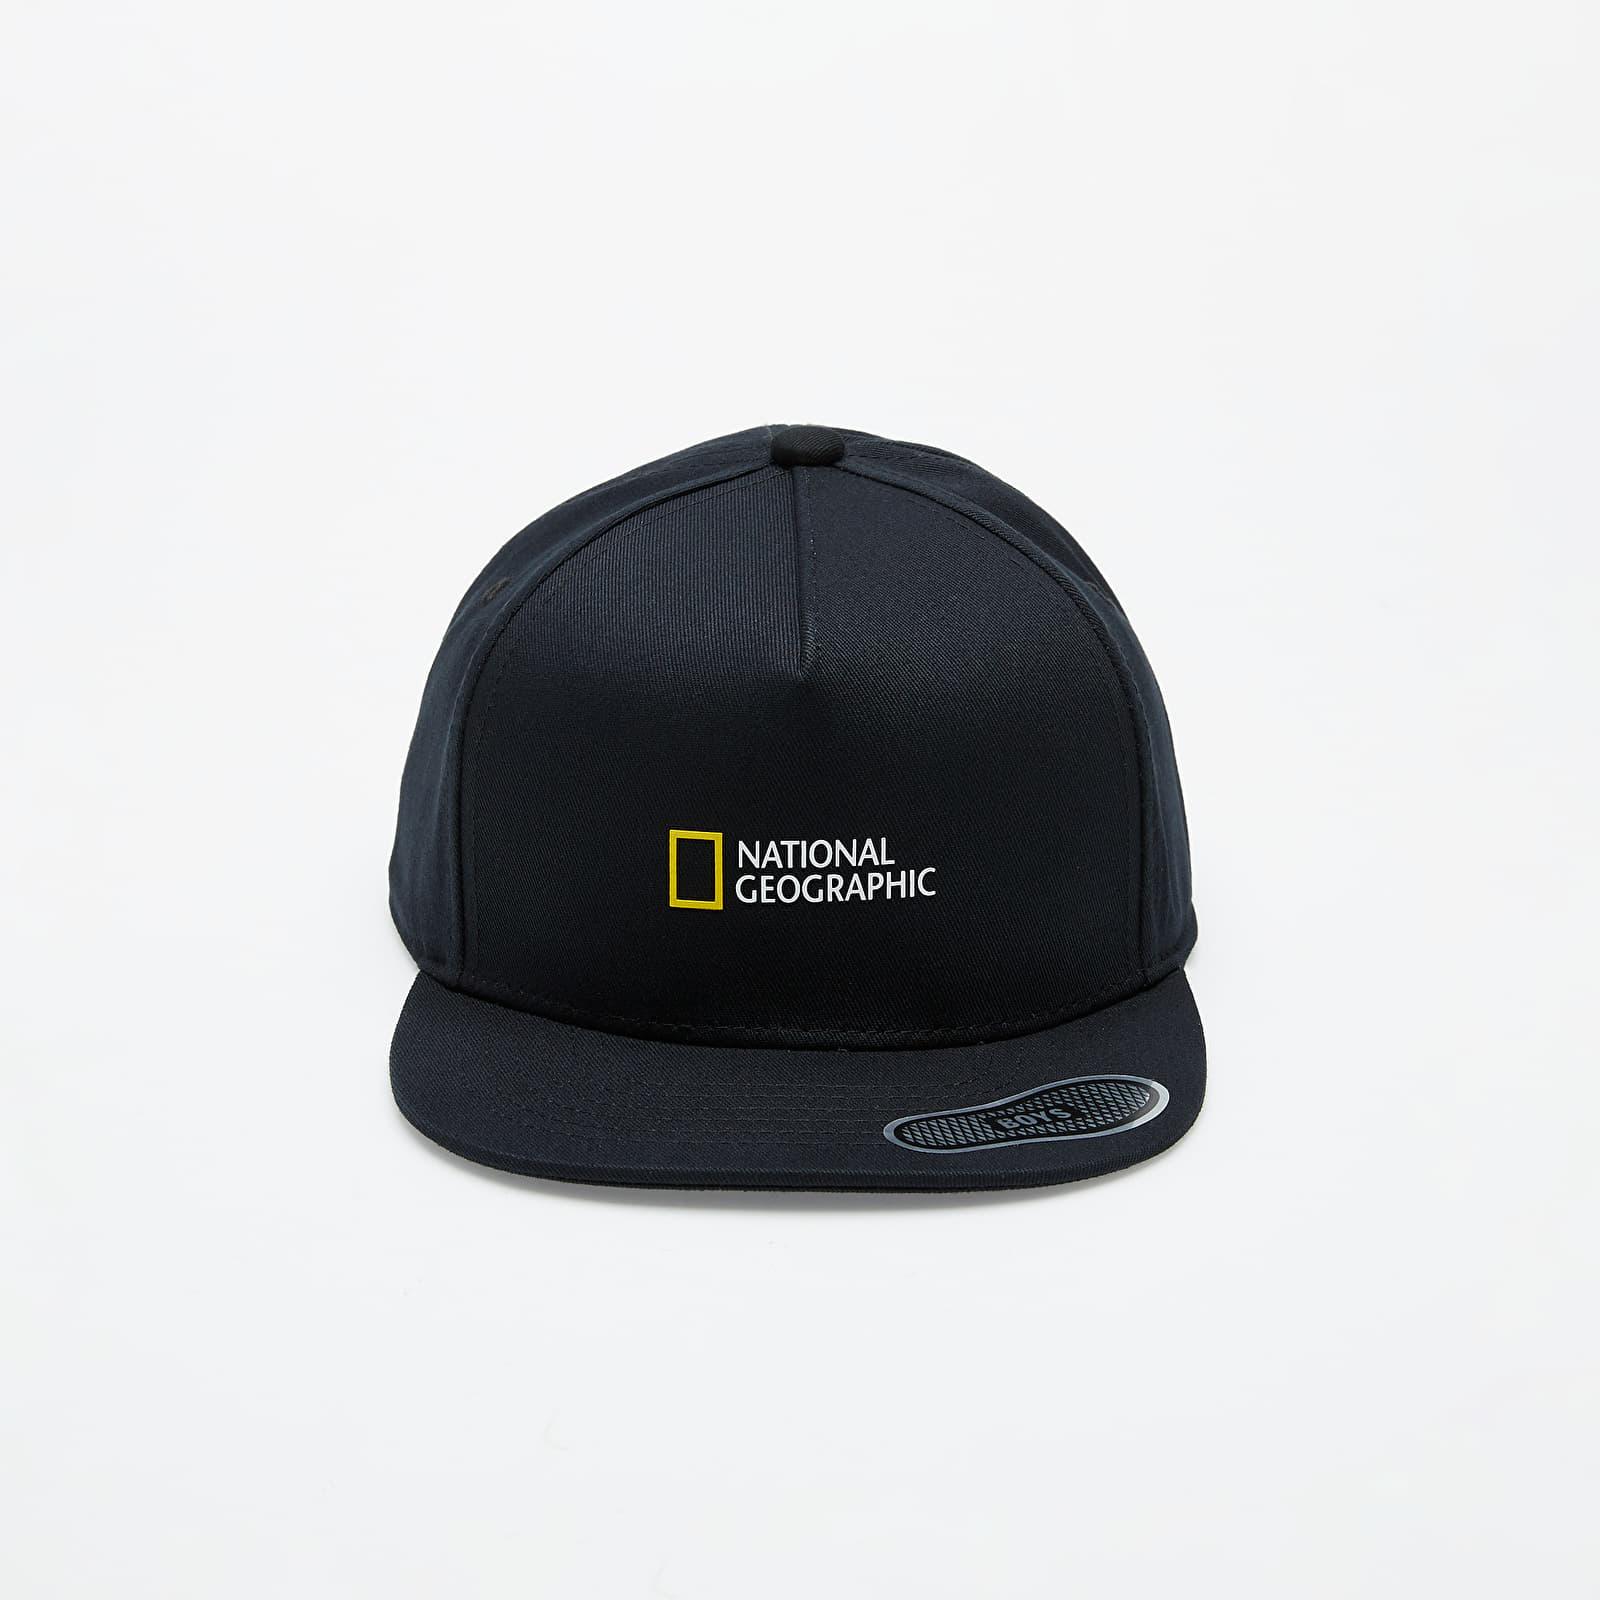 Vans x National Geographic Boys Cap